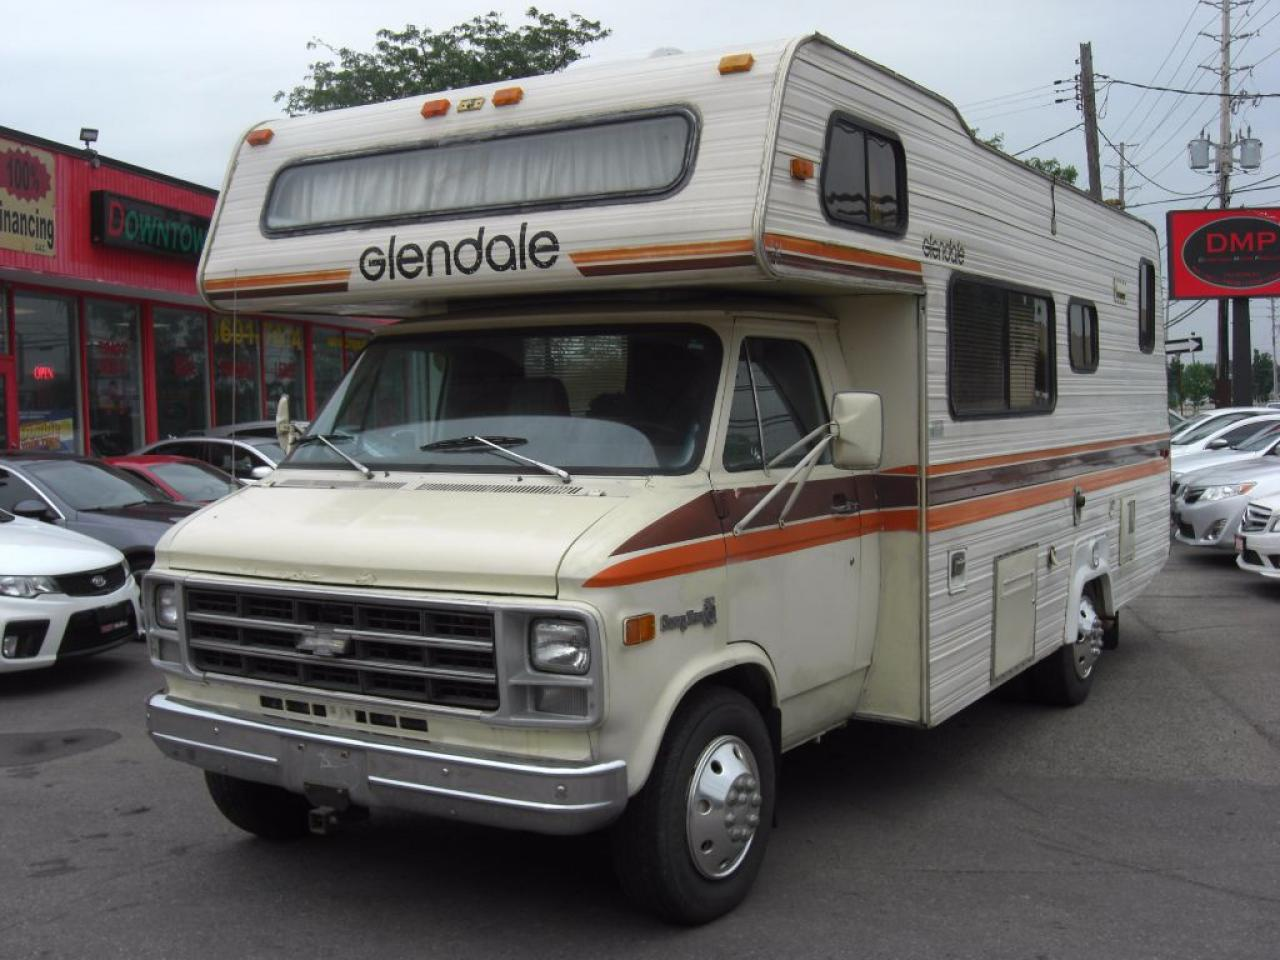 1979 Chevrolet C30/K30 Glendale Motorhome